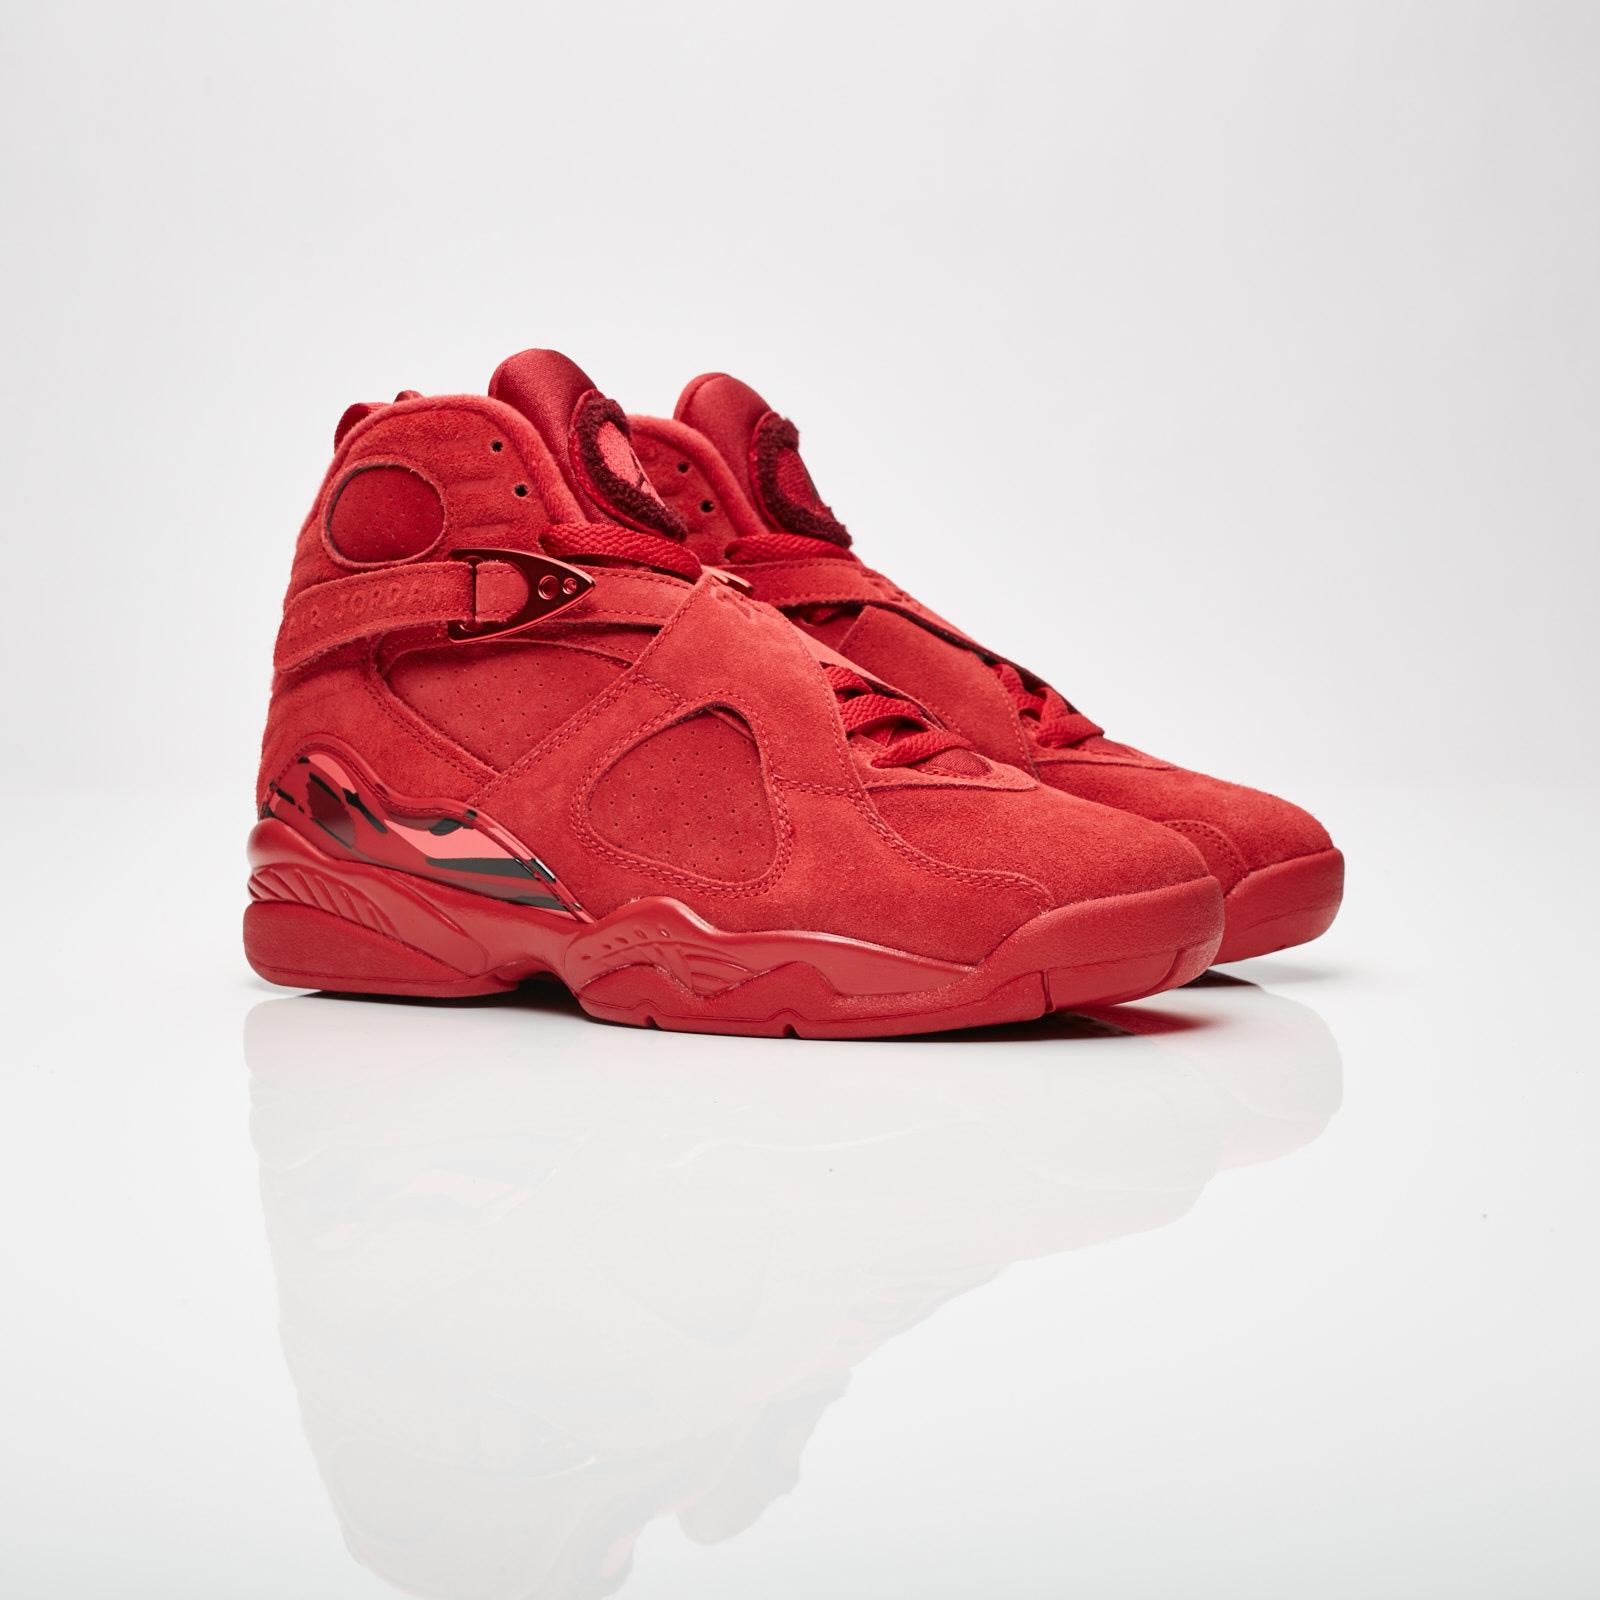 sale retailer c27d7 d3606 Jordan Brand Wmns Air Jordan 8 Retro Valentines Day - Aq2449 ...